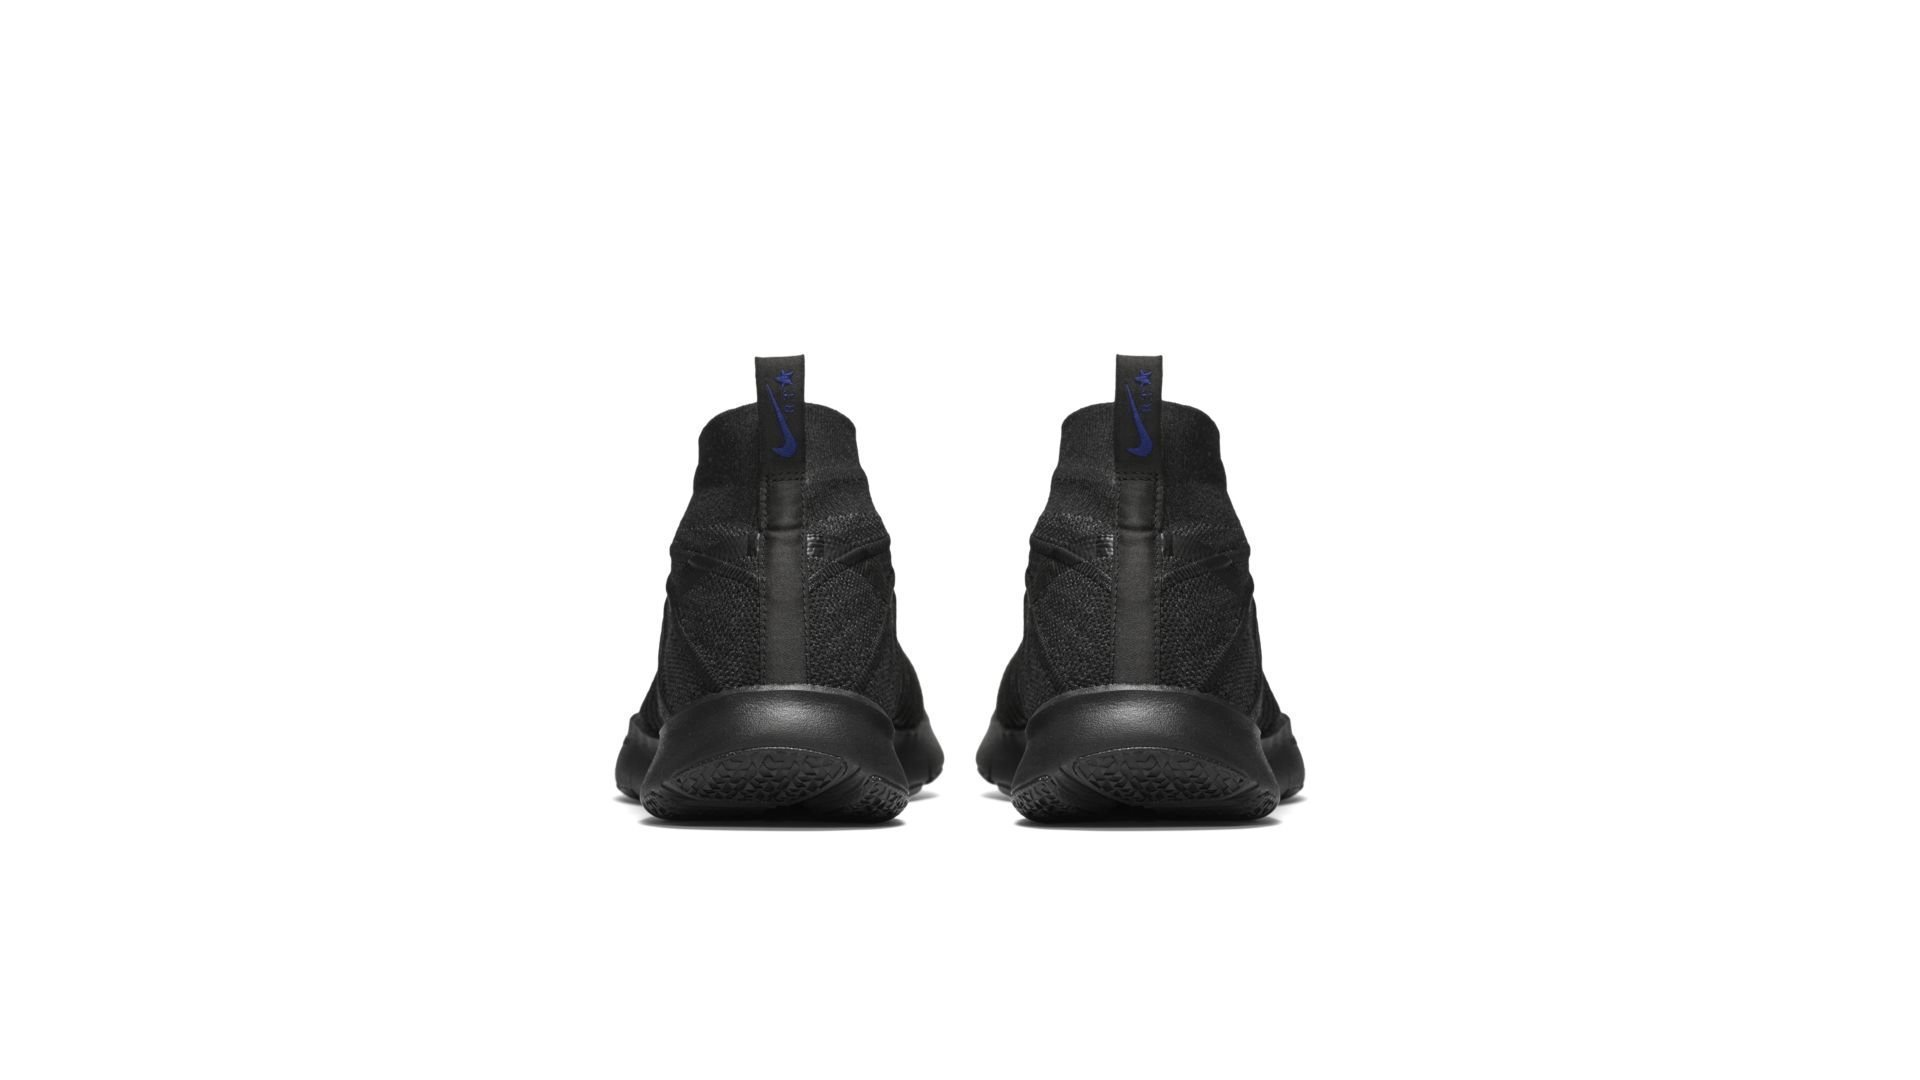 Nike Free TR Force Flyknit Riccardo Tisci Black (844461-001)